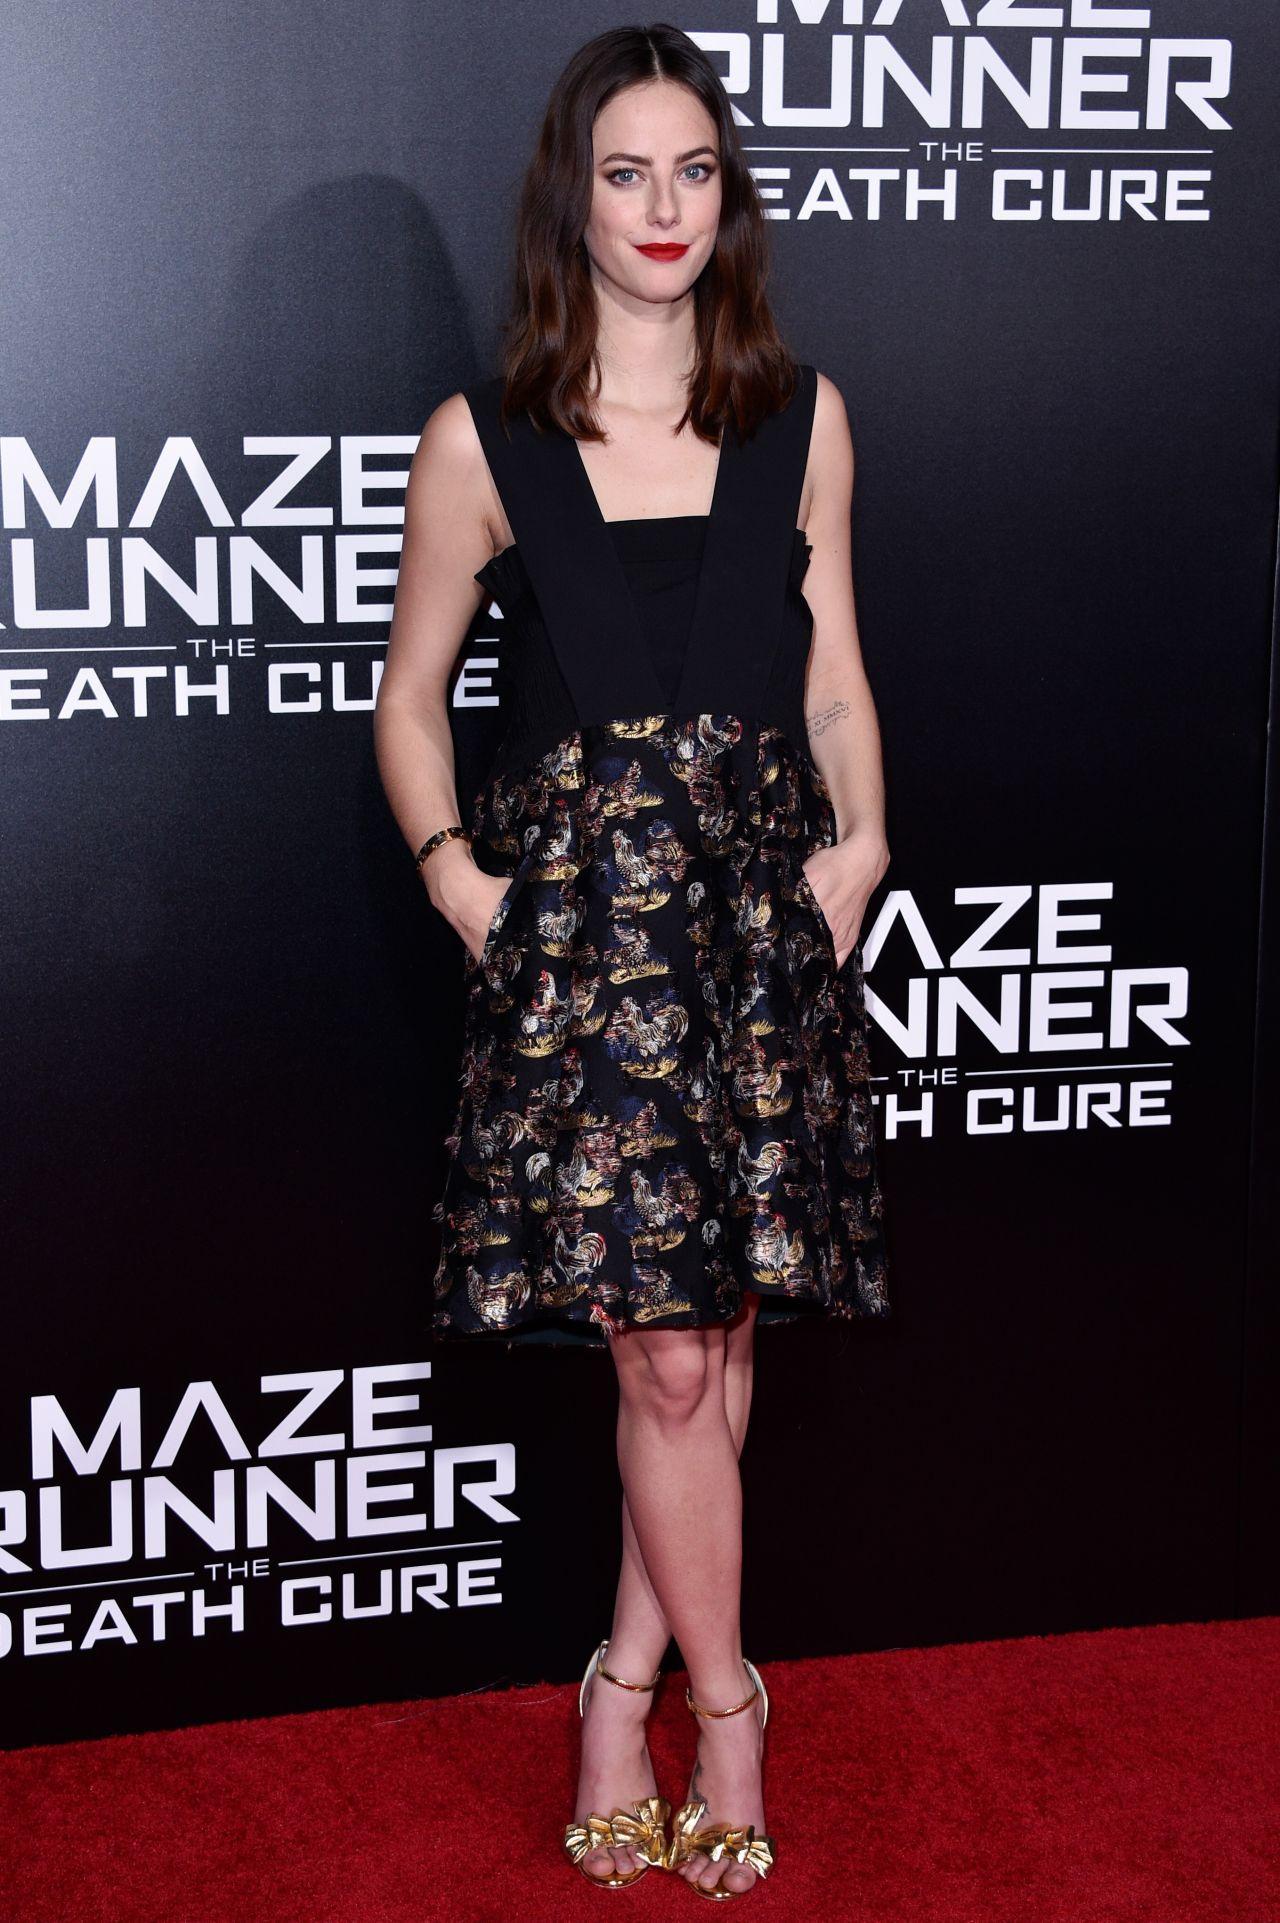 http://celebmafia.com/wp-content/uploads/2018/01/kaya-scodelario-maze-runner-the-death-cure-premiere-in-la-3.jpg